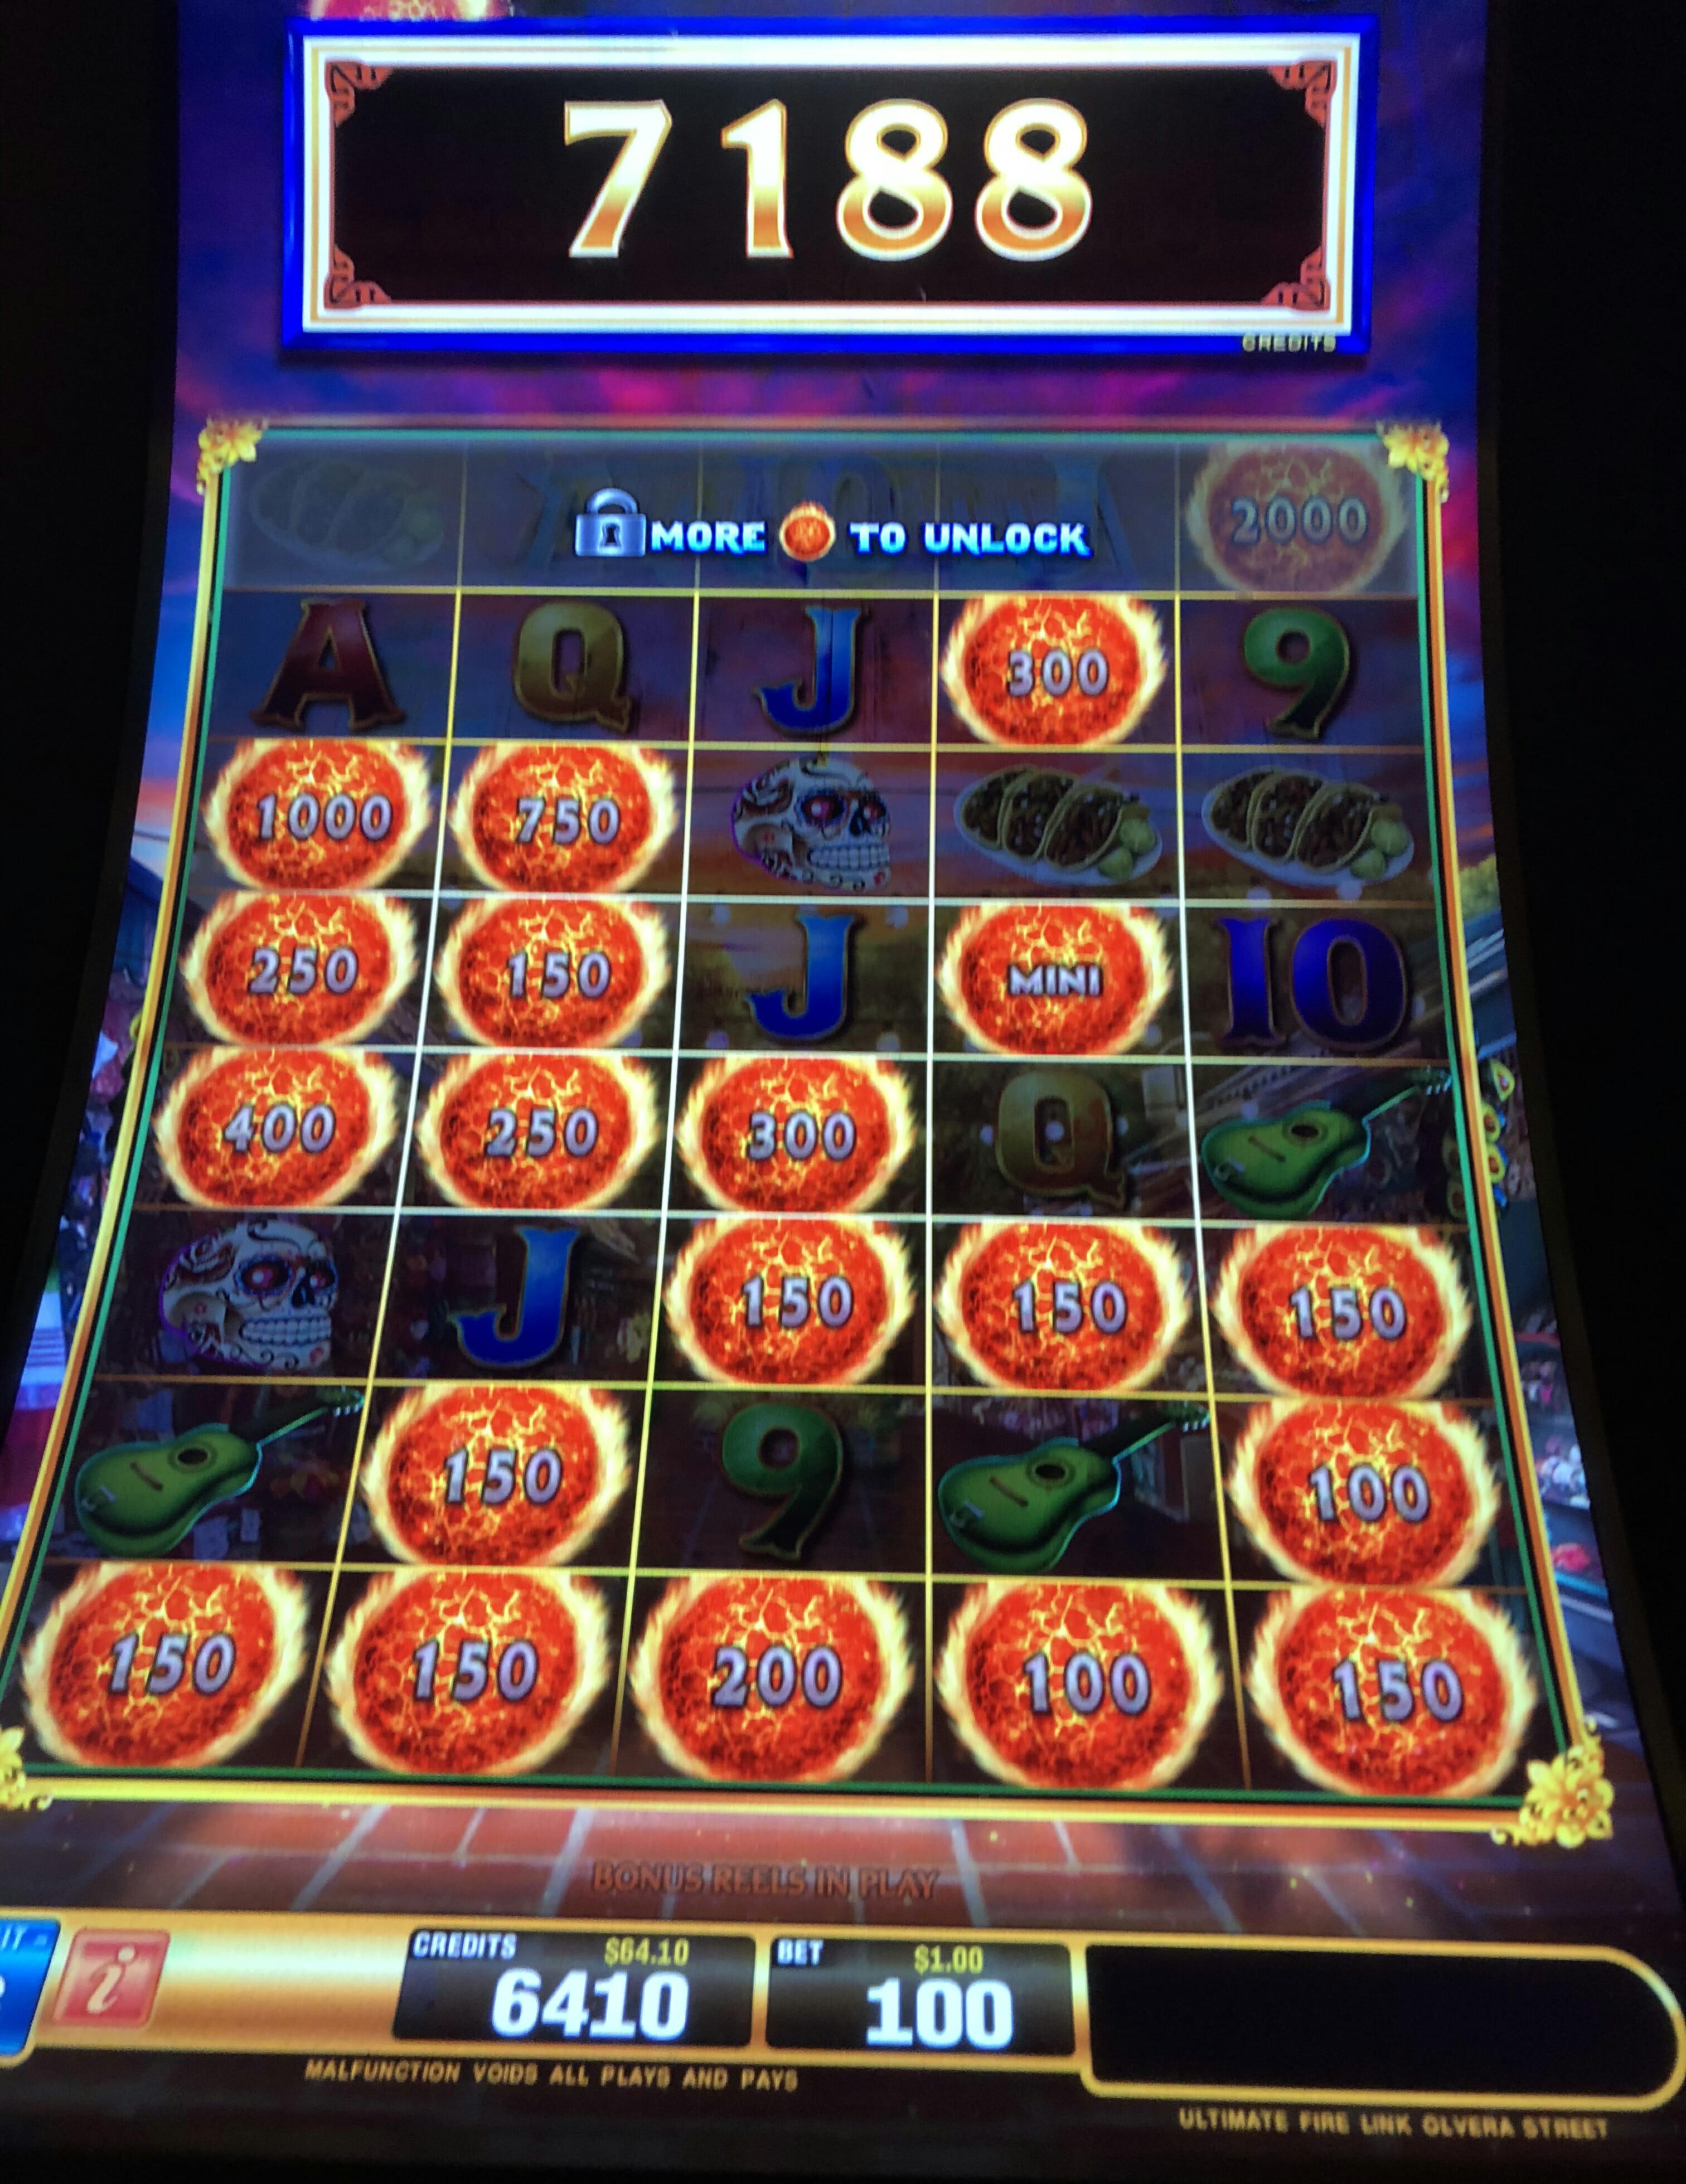 Fireball Gambling Machine